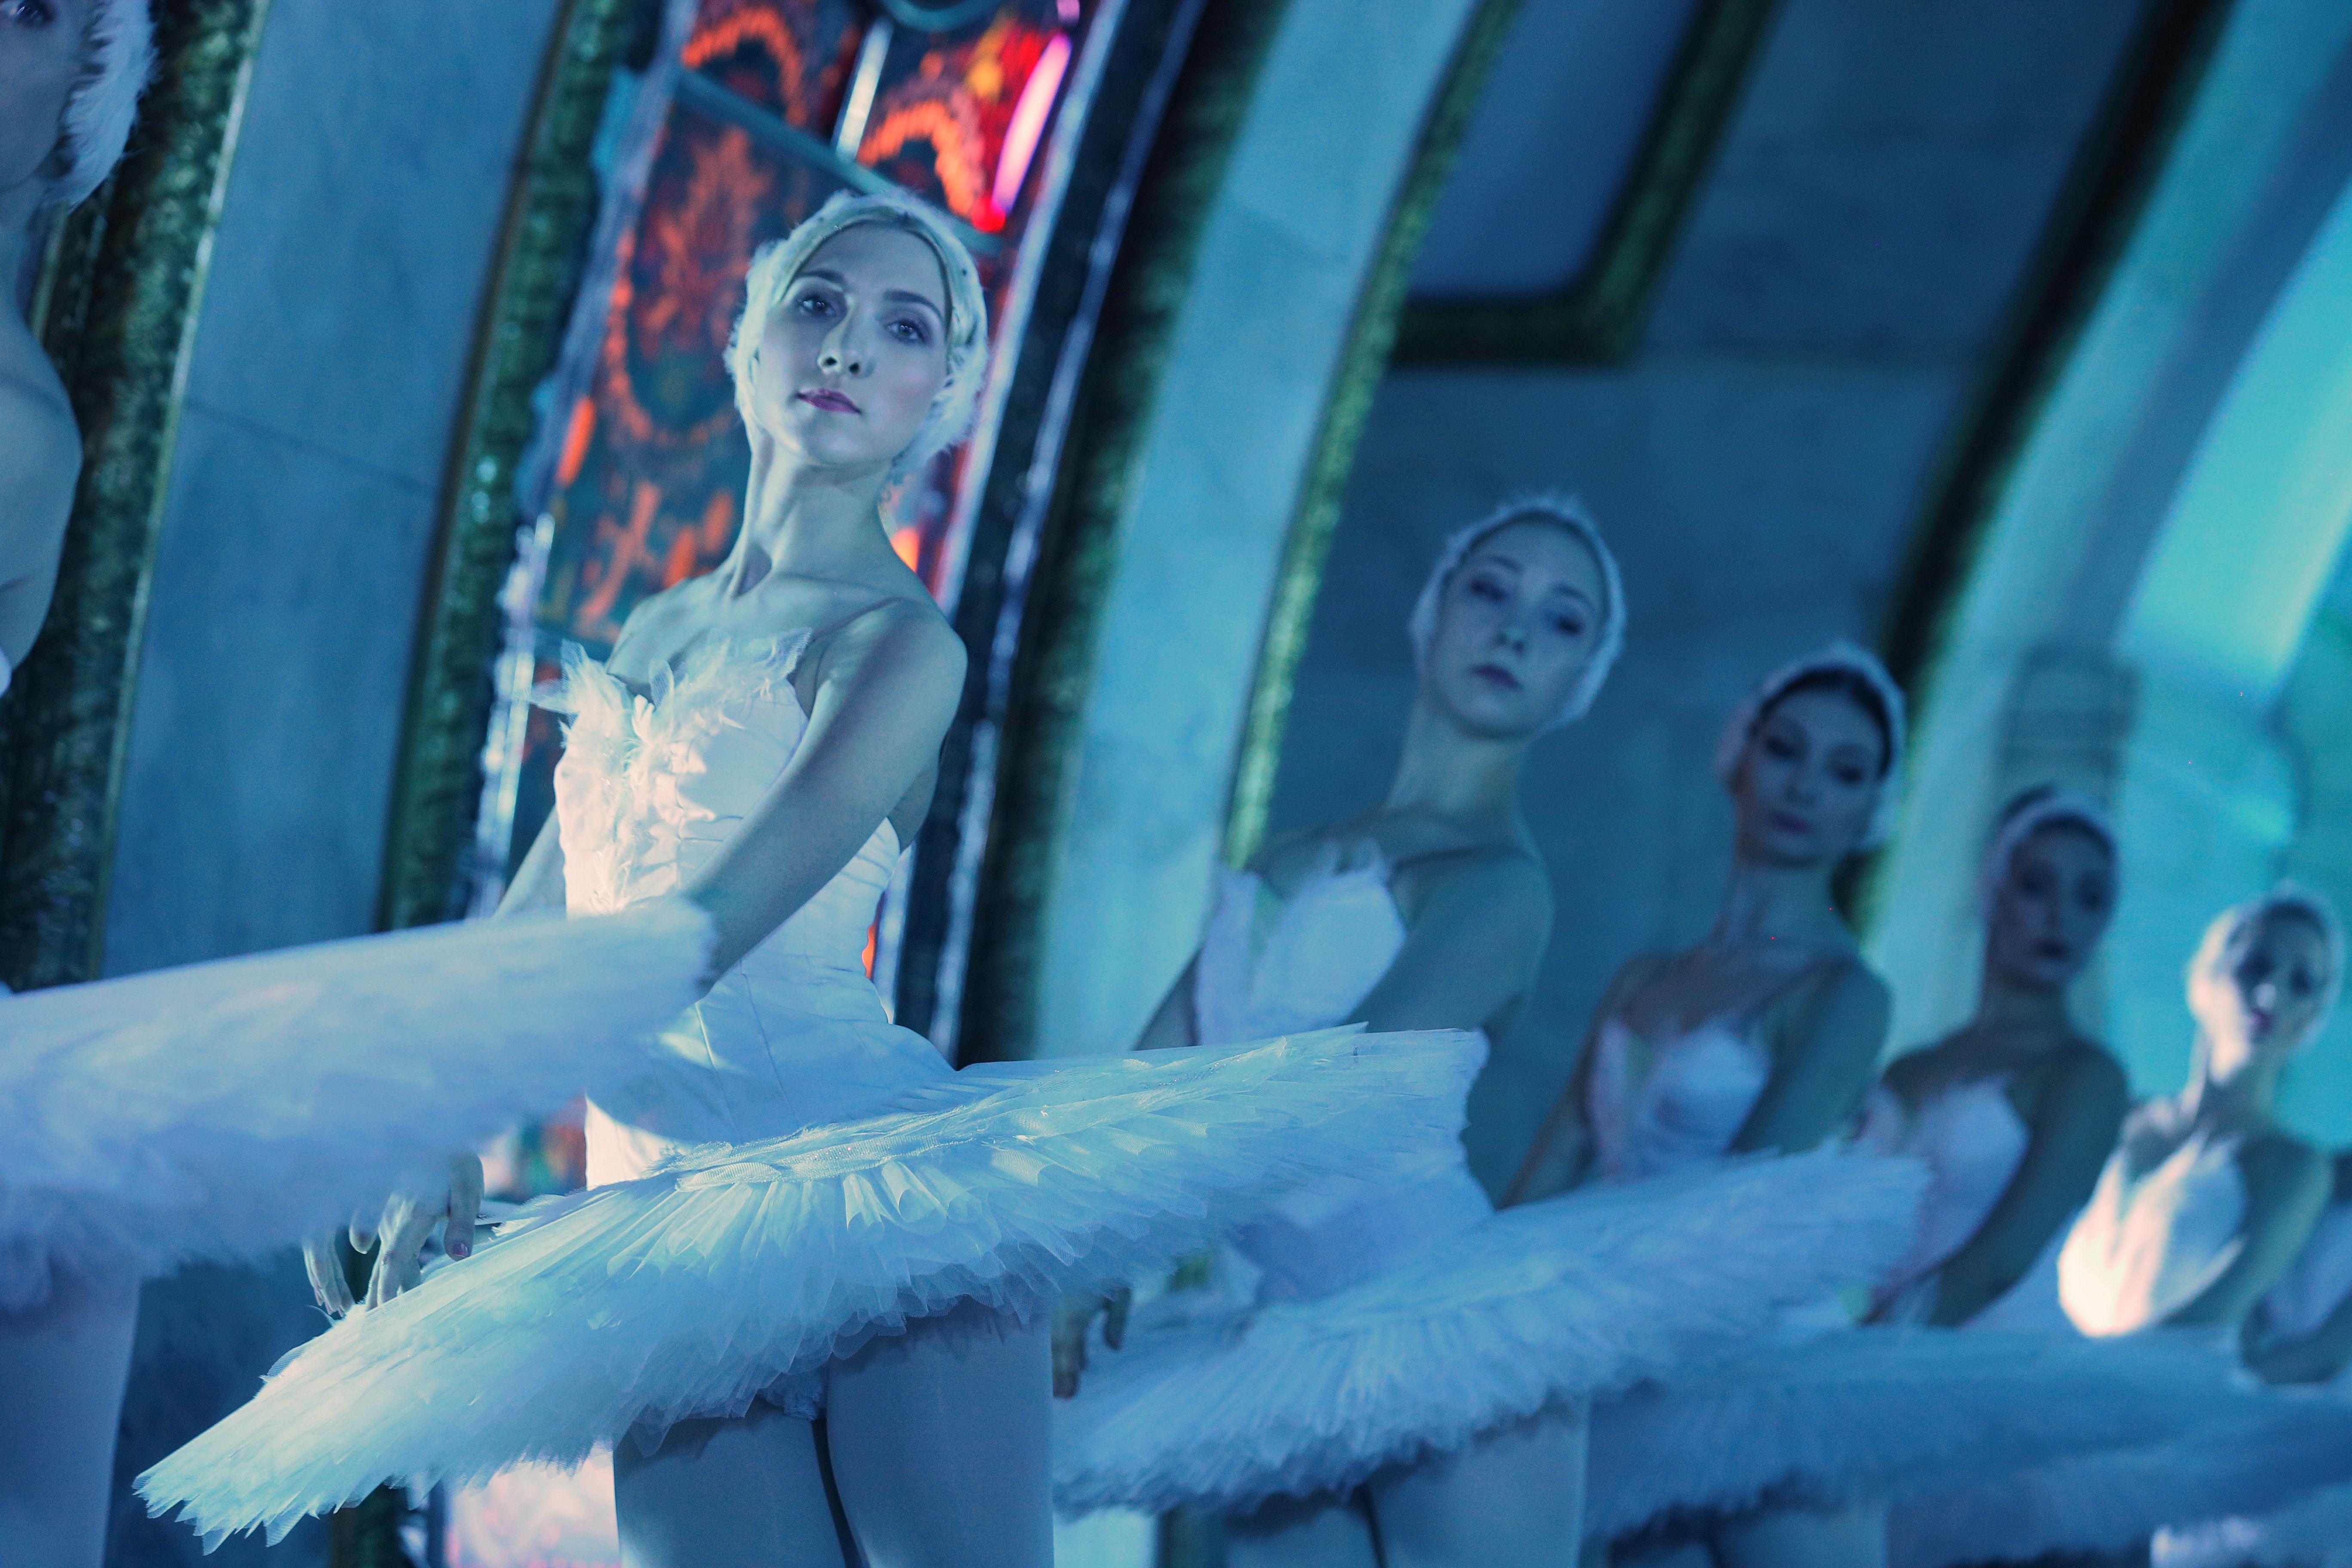 Особенности балета обсудят в Минвнешторге